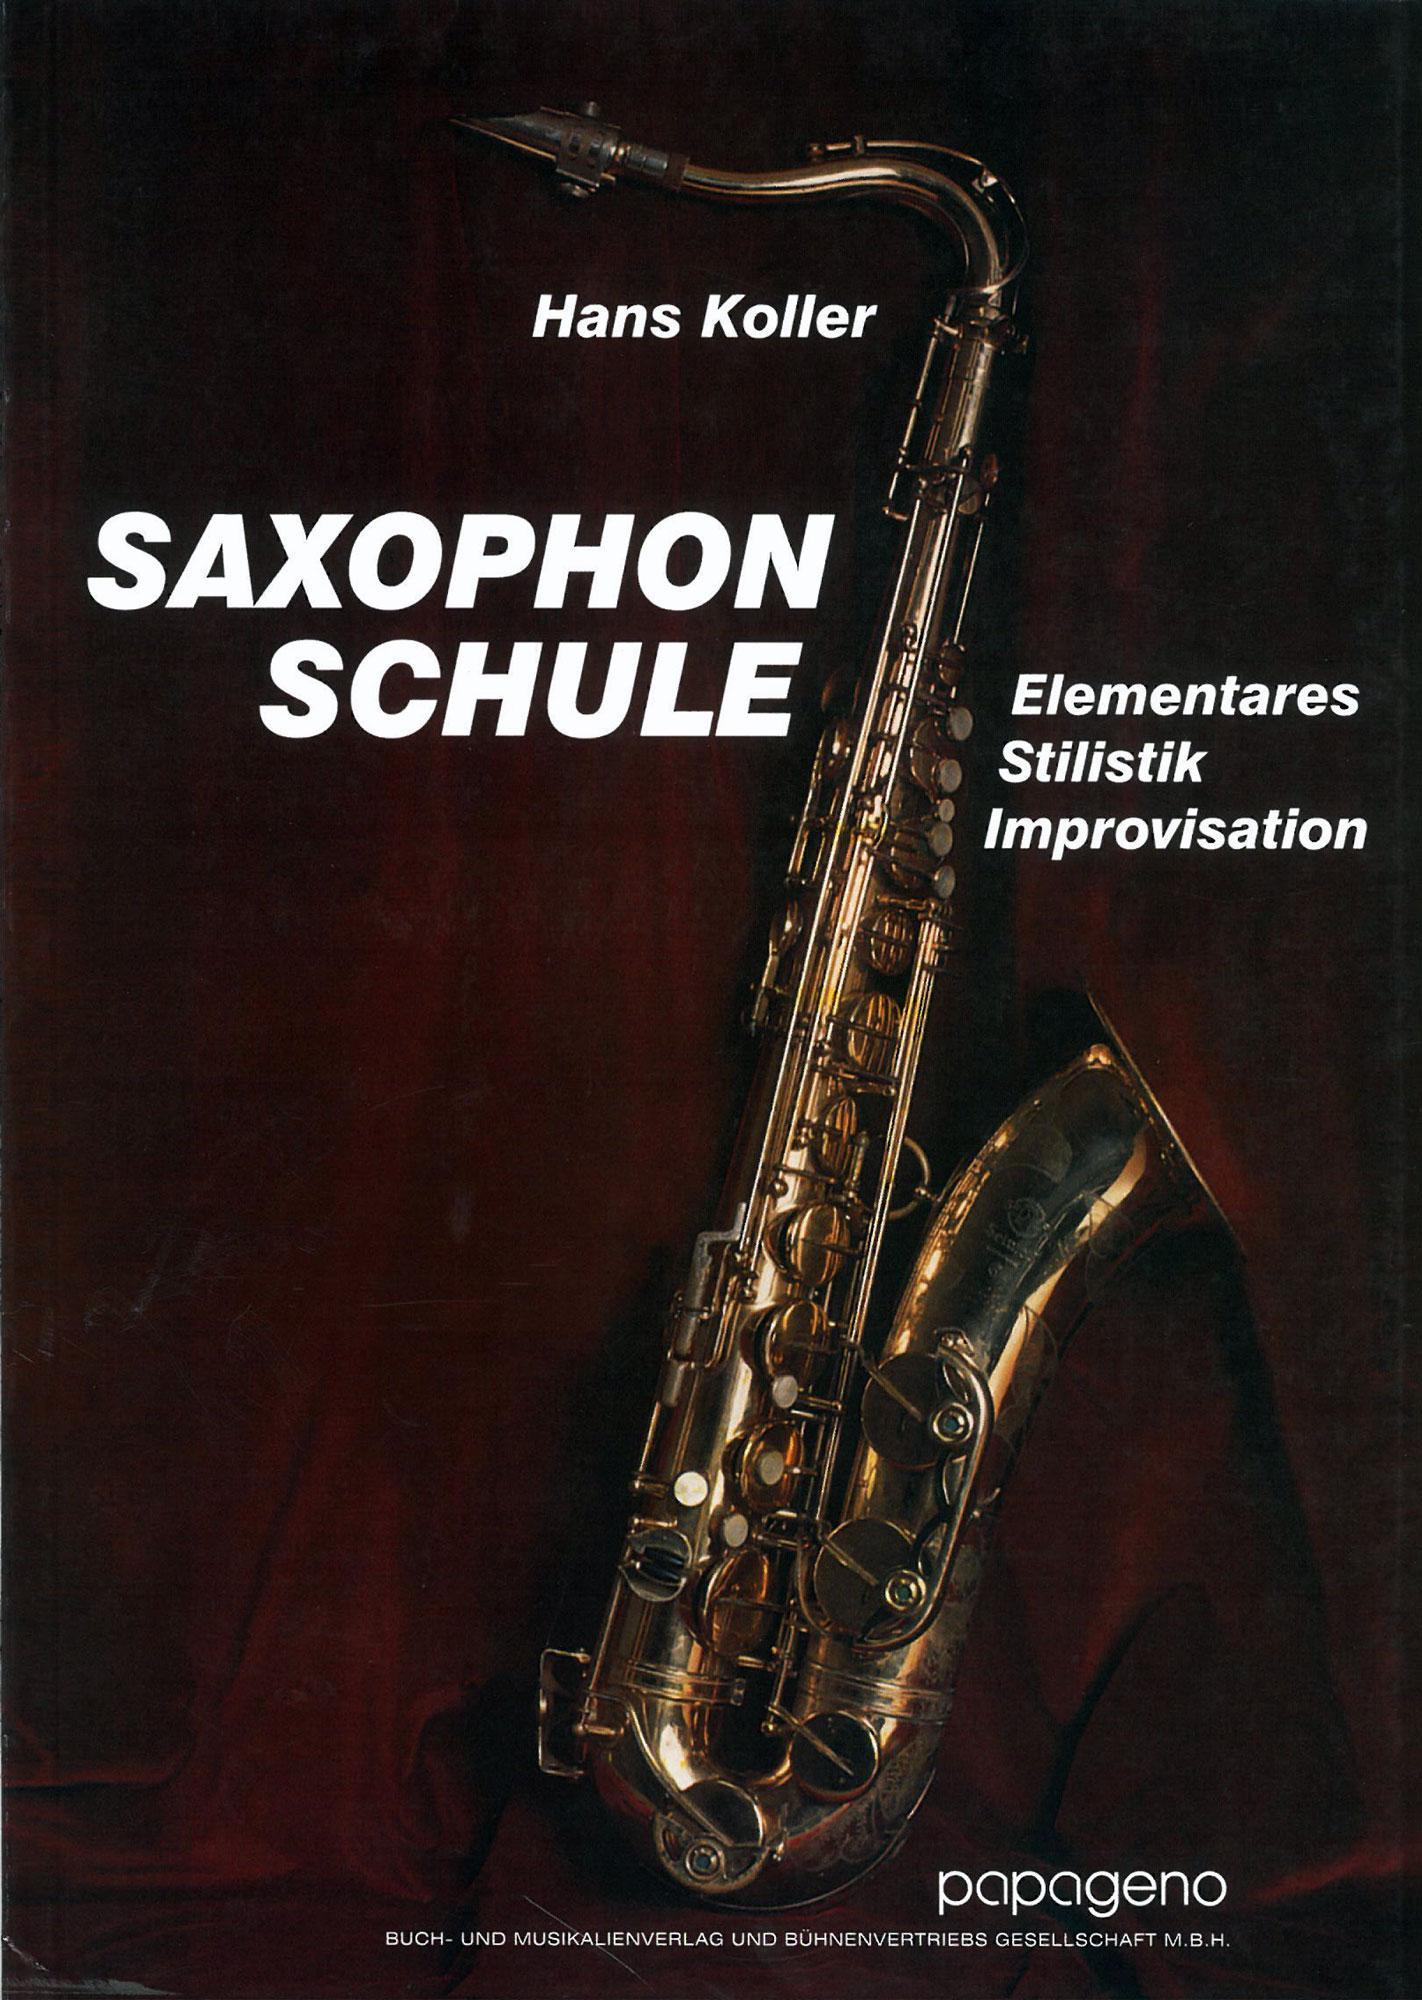 Hans Koller Saxophon Schule